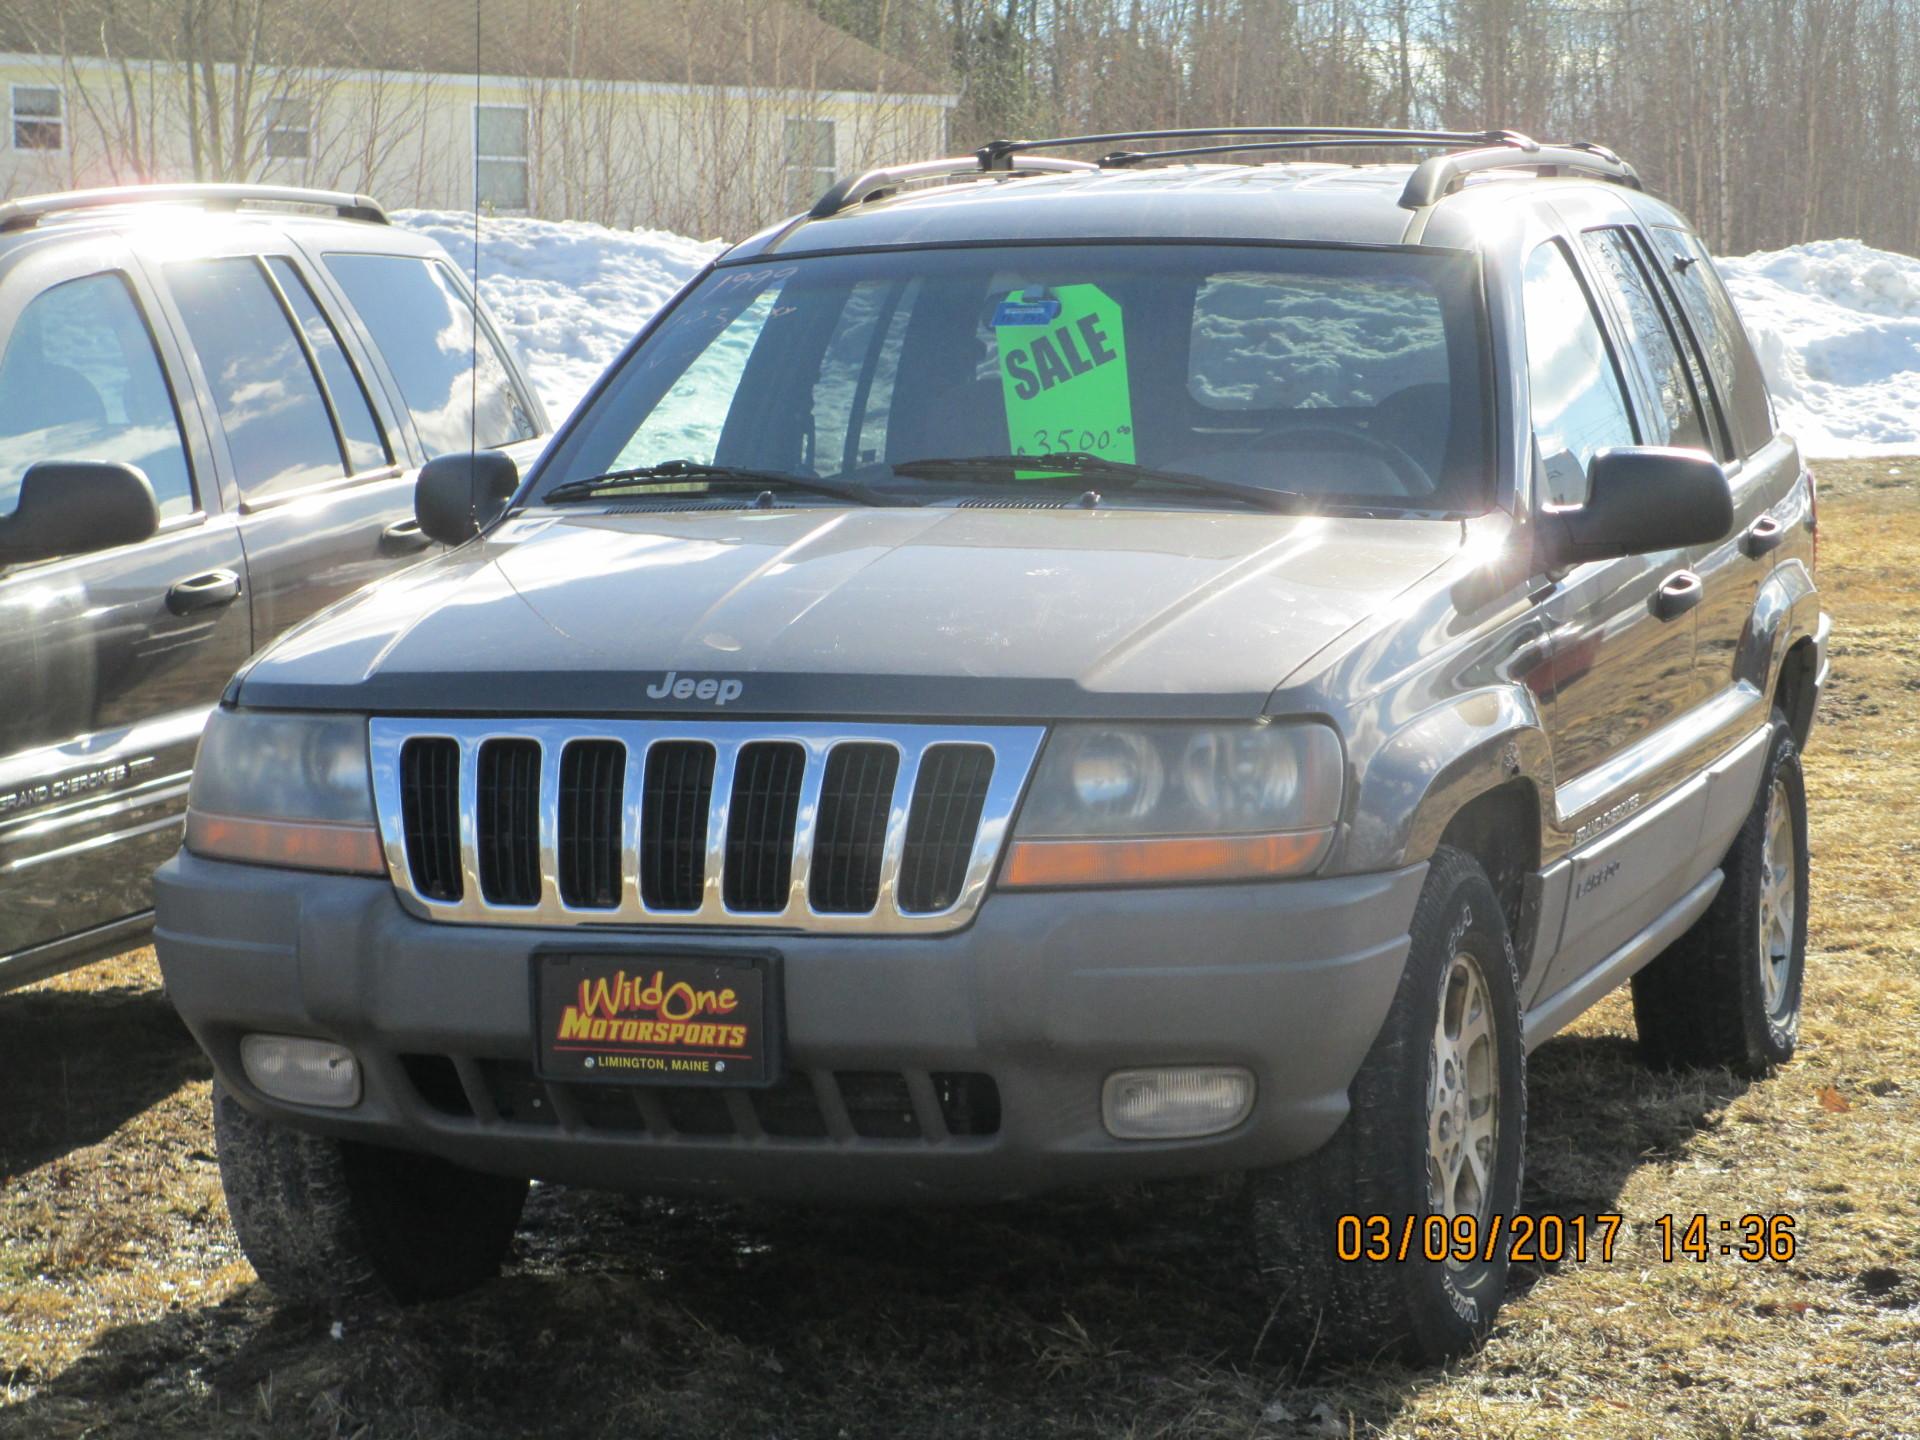 1999 Jeep Grand Cherokee - Brown